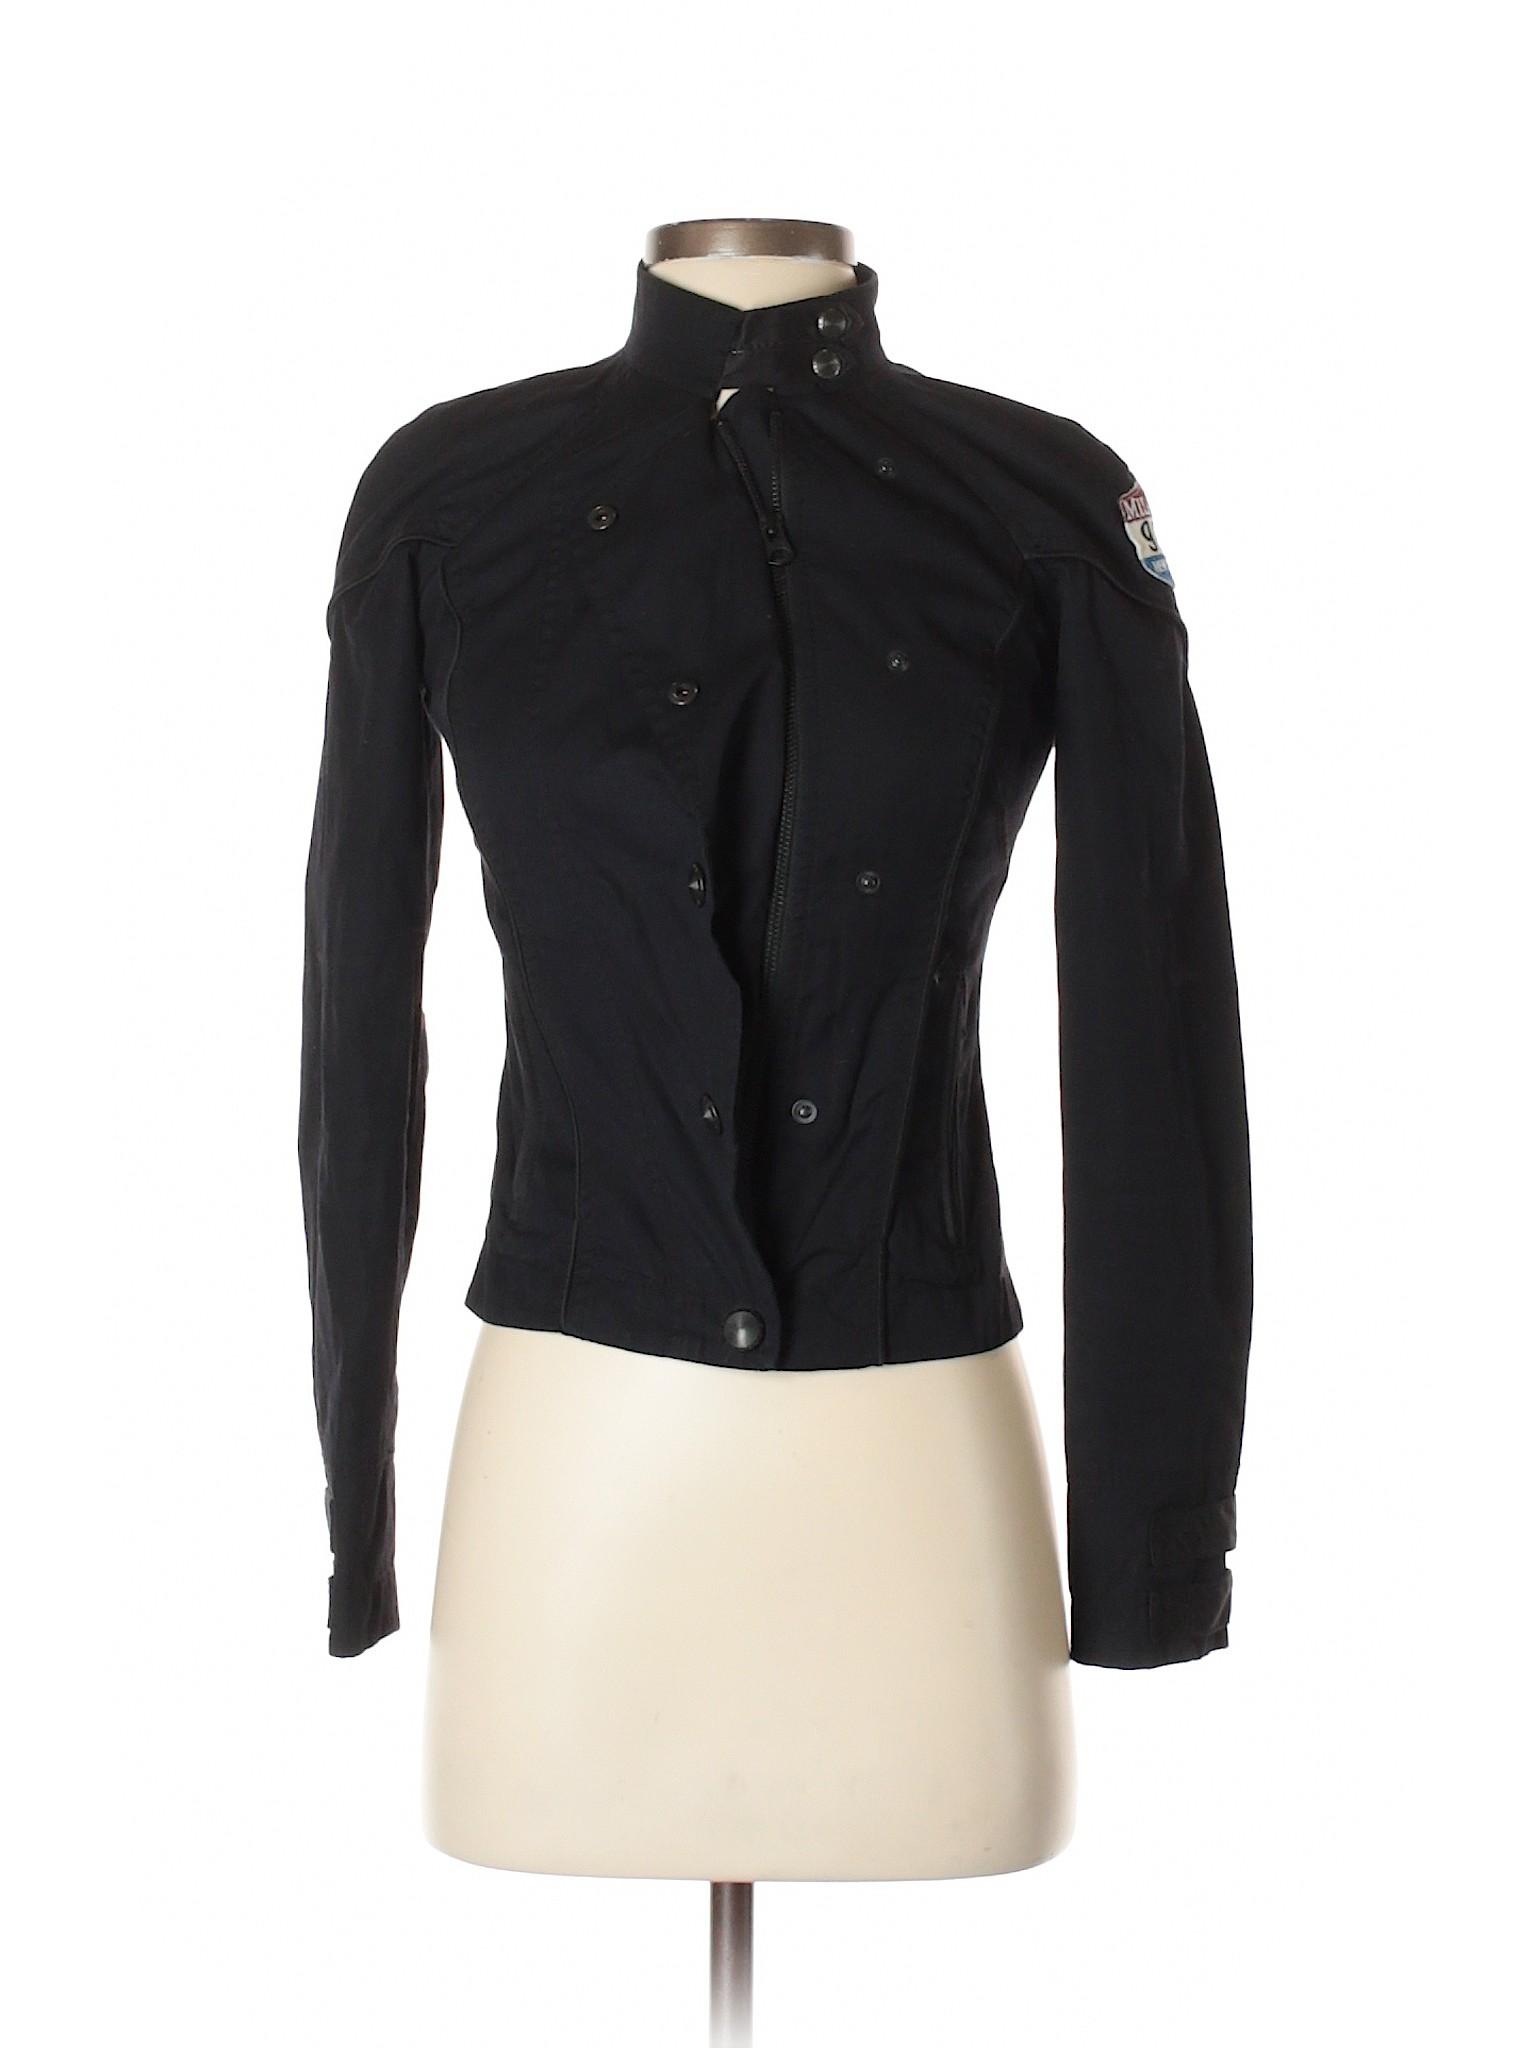 Armani Jacket Boutique leisure Boutique Exchange leisure wzw8OqF